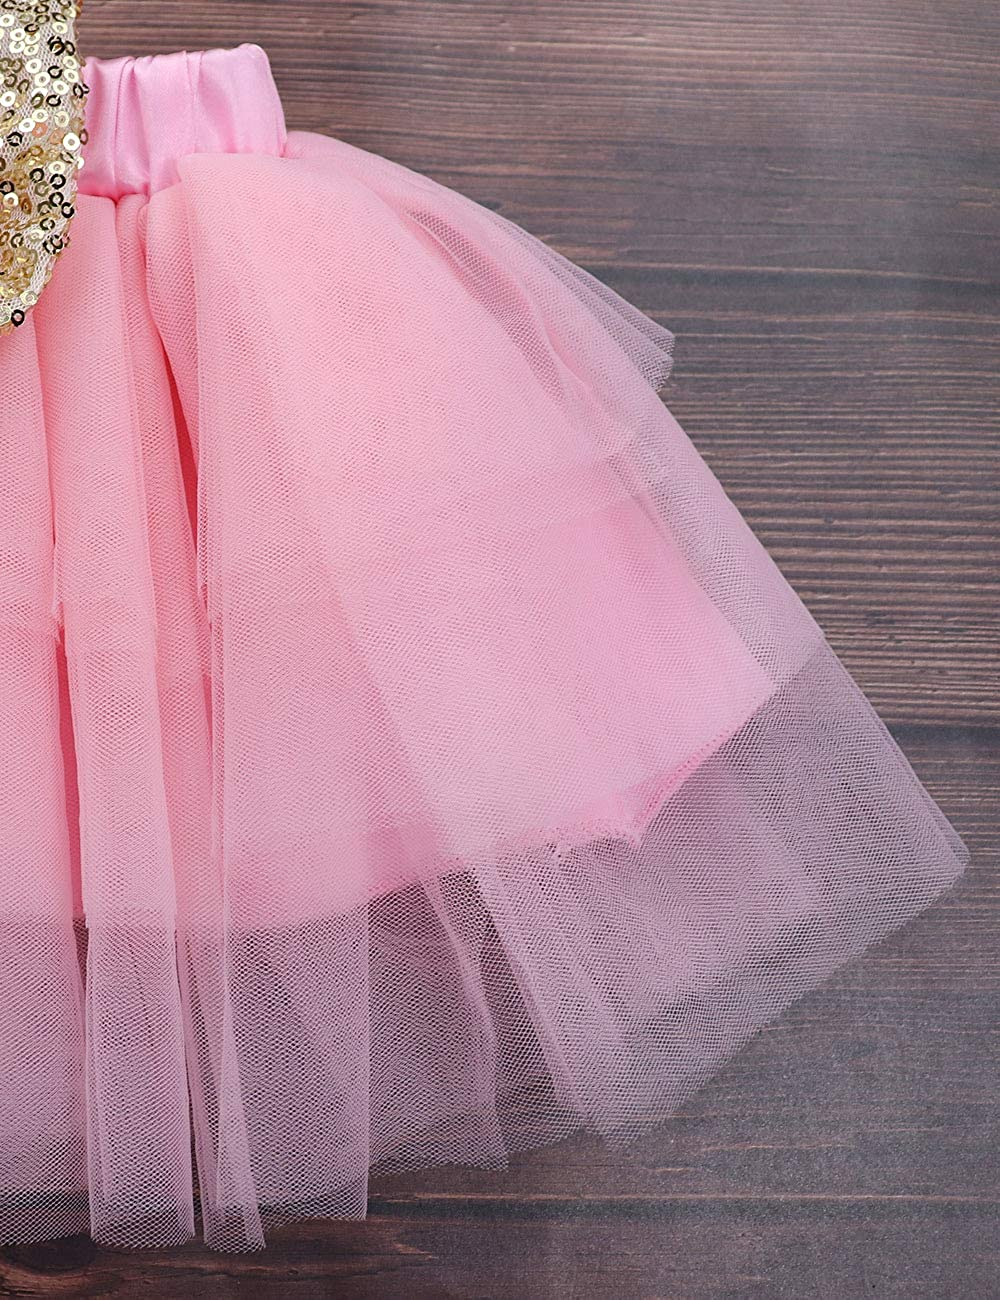 Tutu Dress 1st Birthday Outfit Set KANGKANG Baby Girls Shark Doo Doo Doo Romper